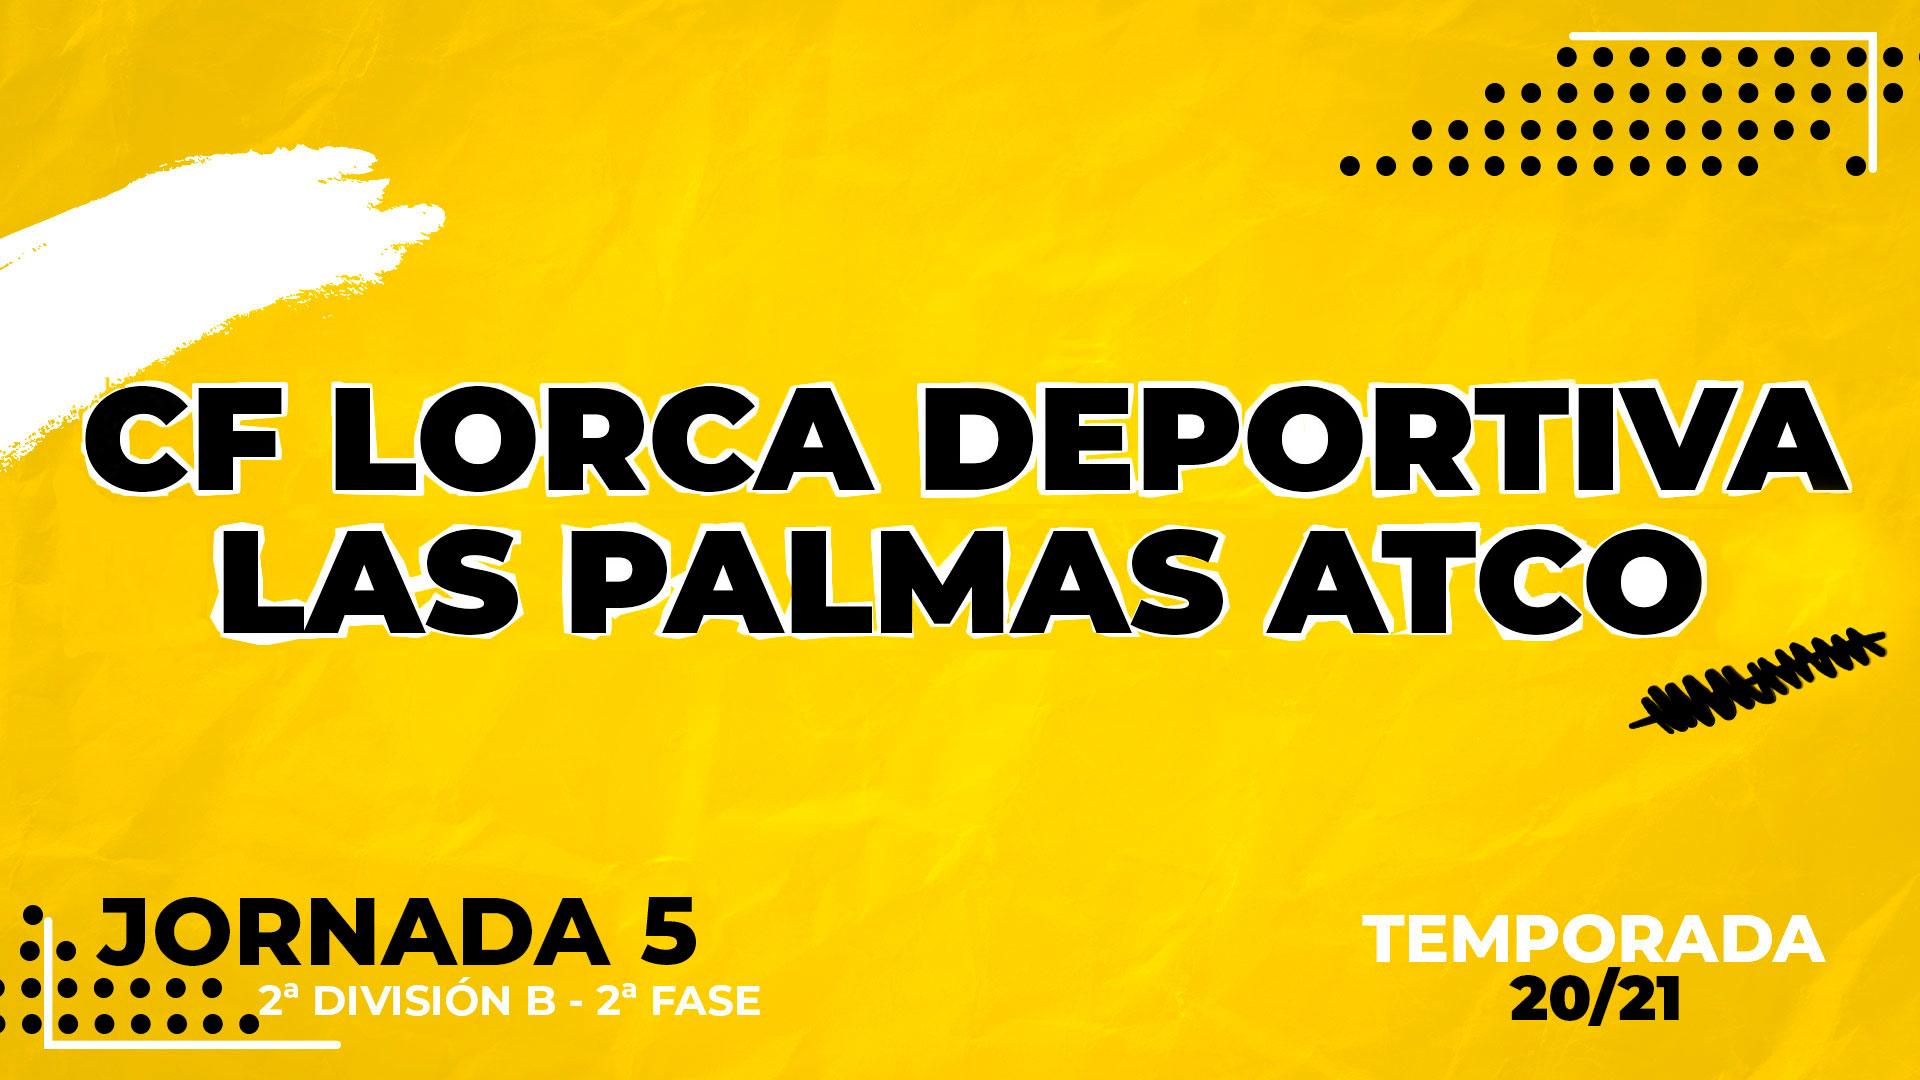 Lorca vs Las Palmas Atlético